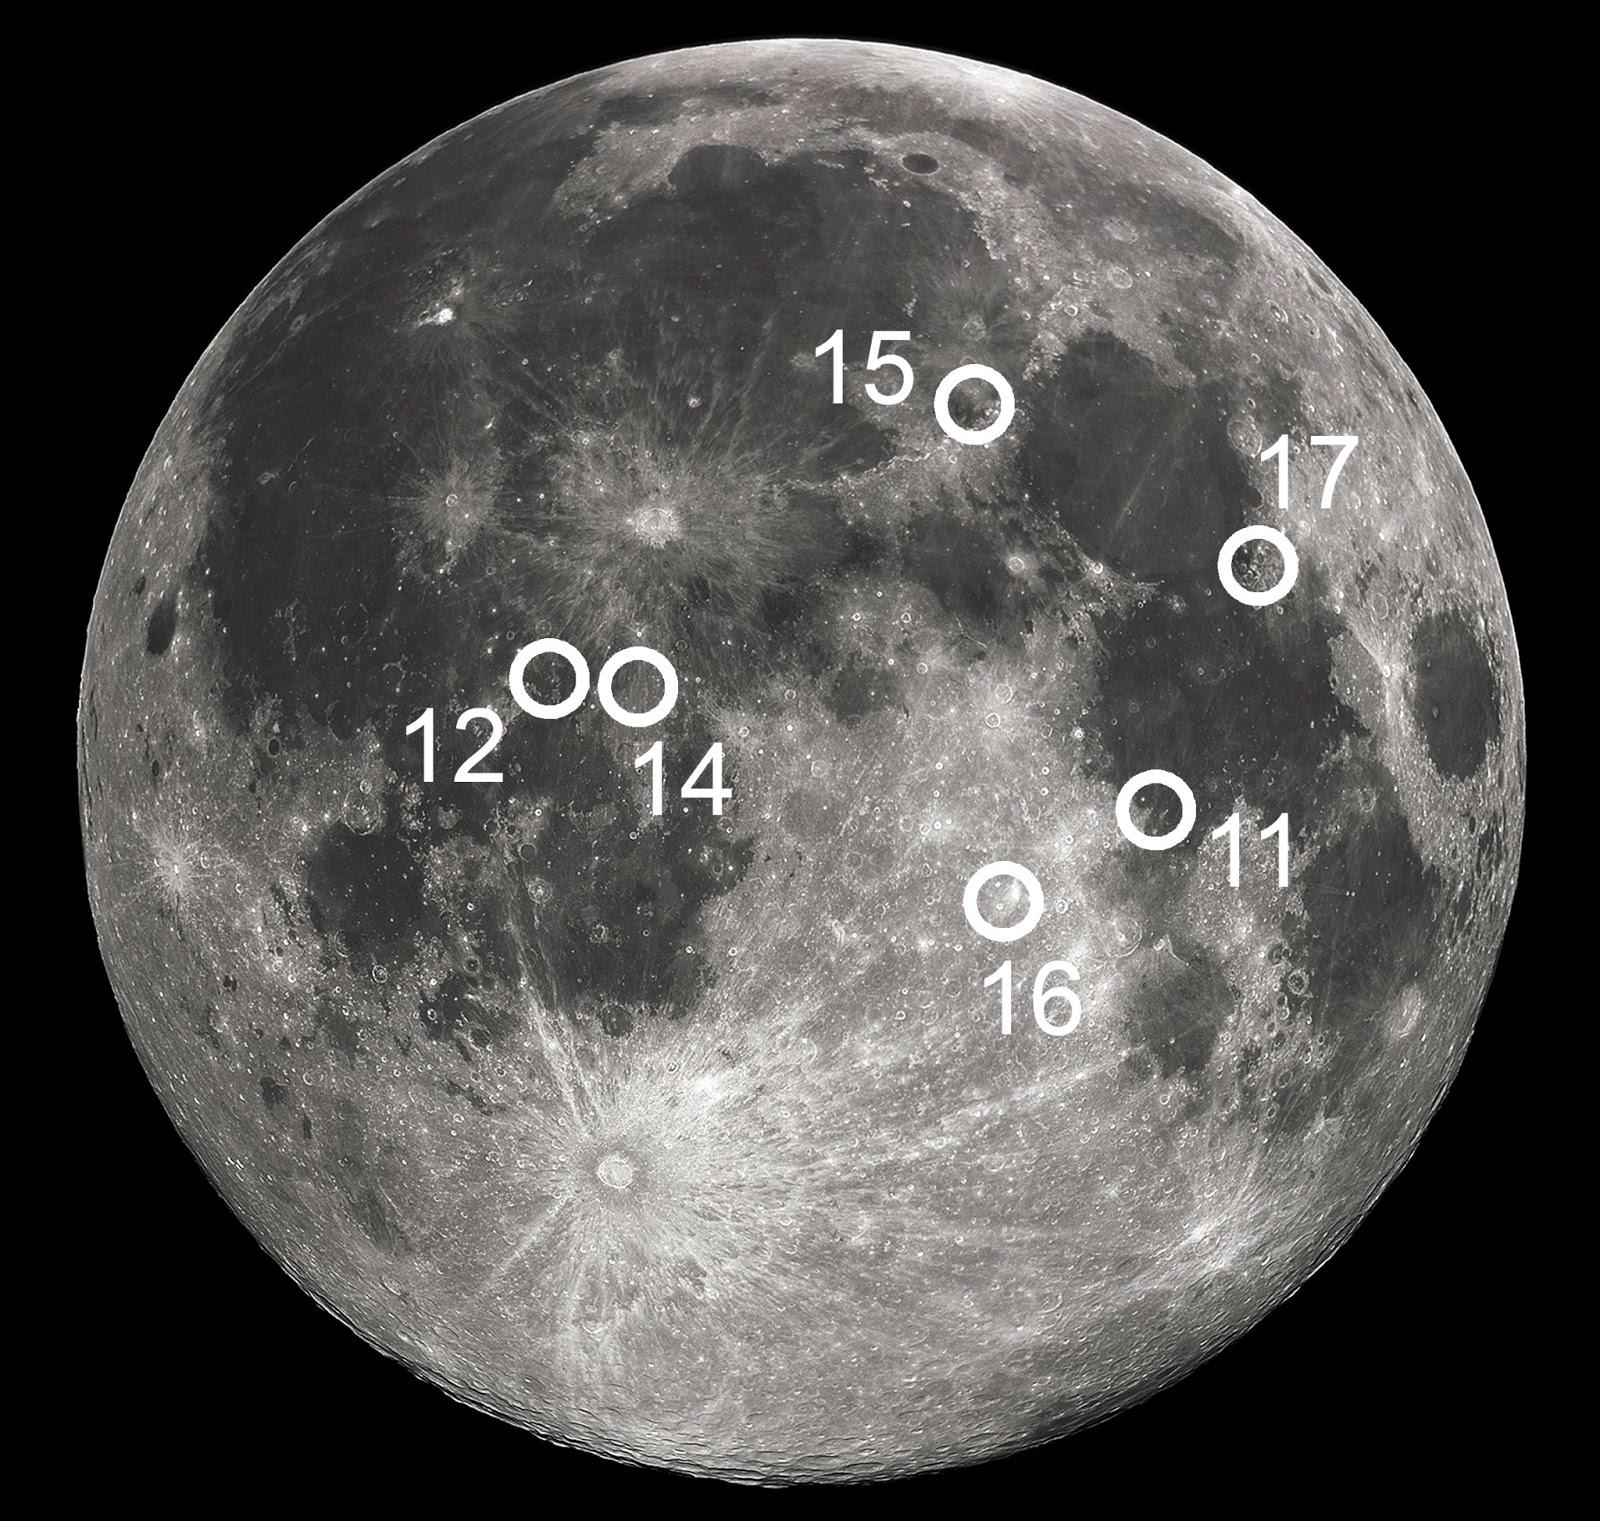 lunar lander site - photo #19